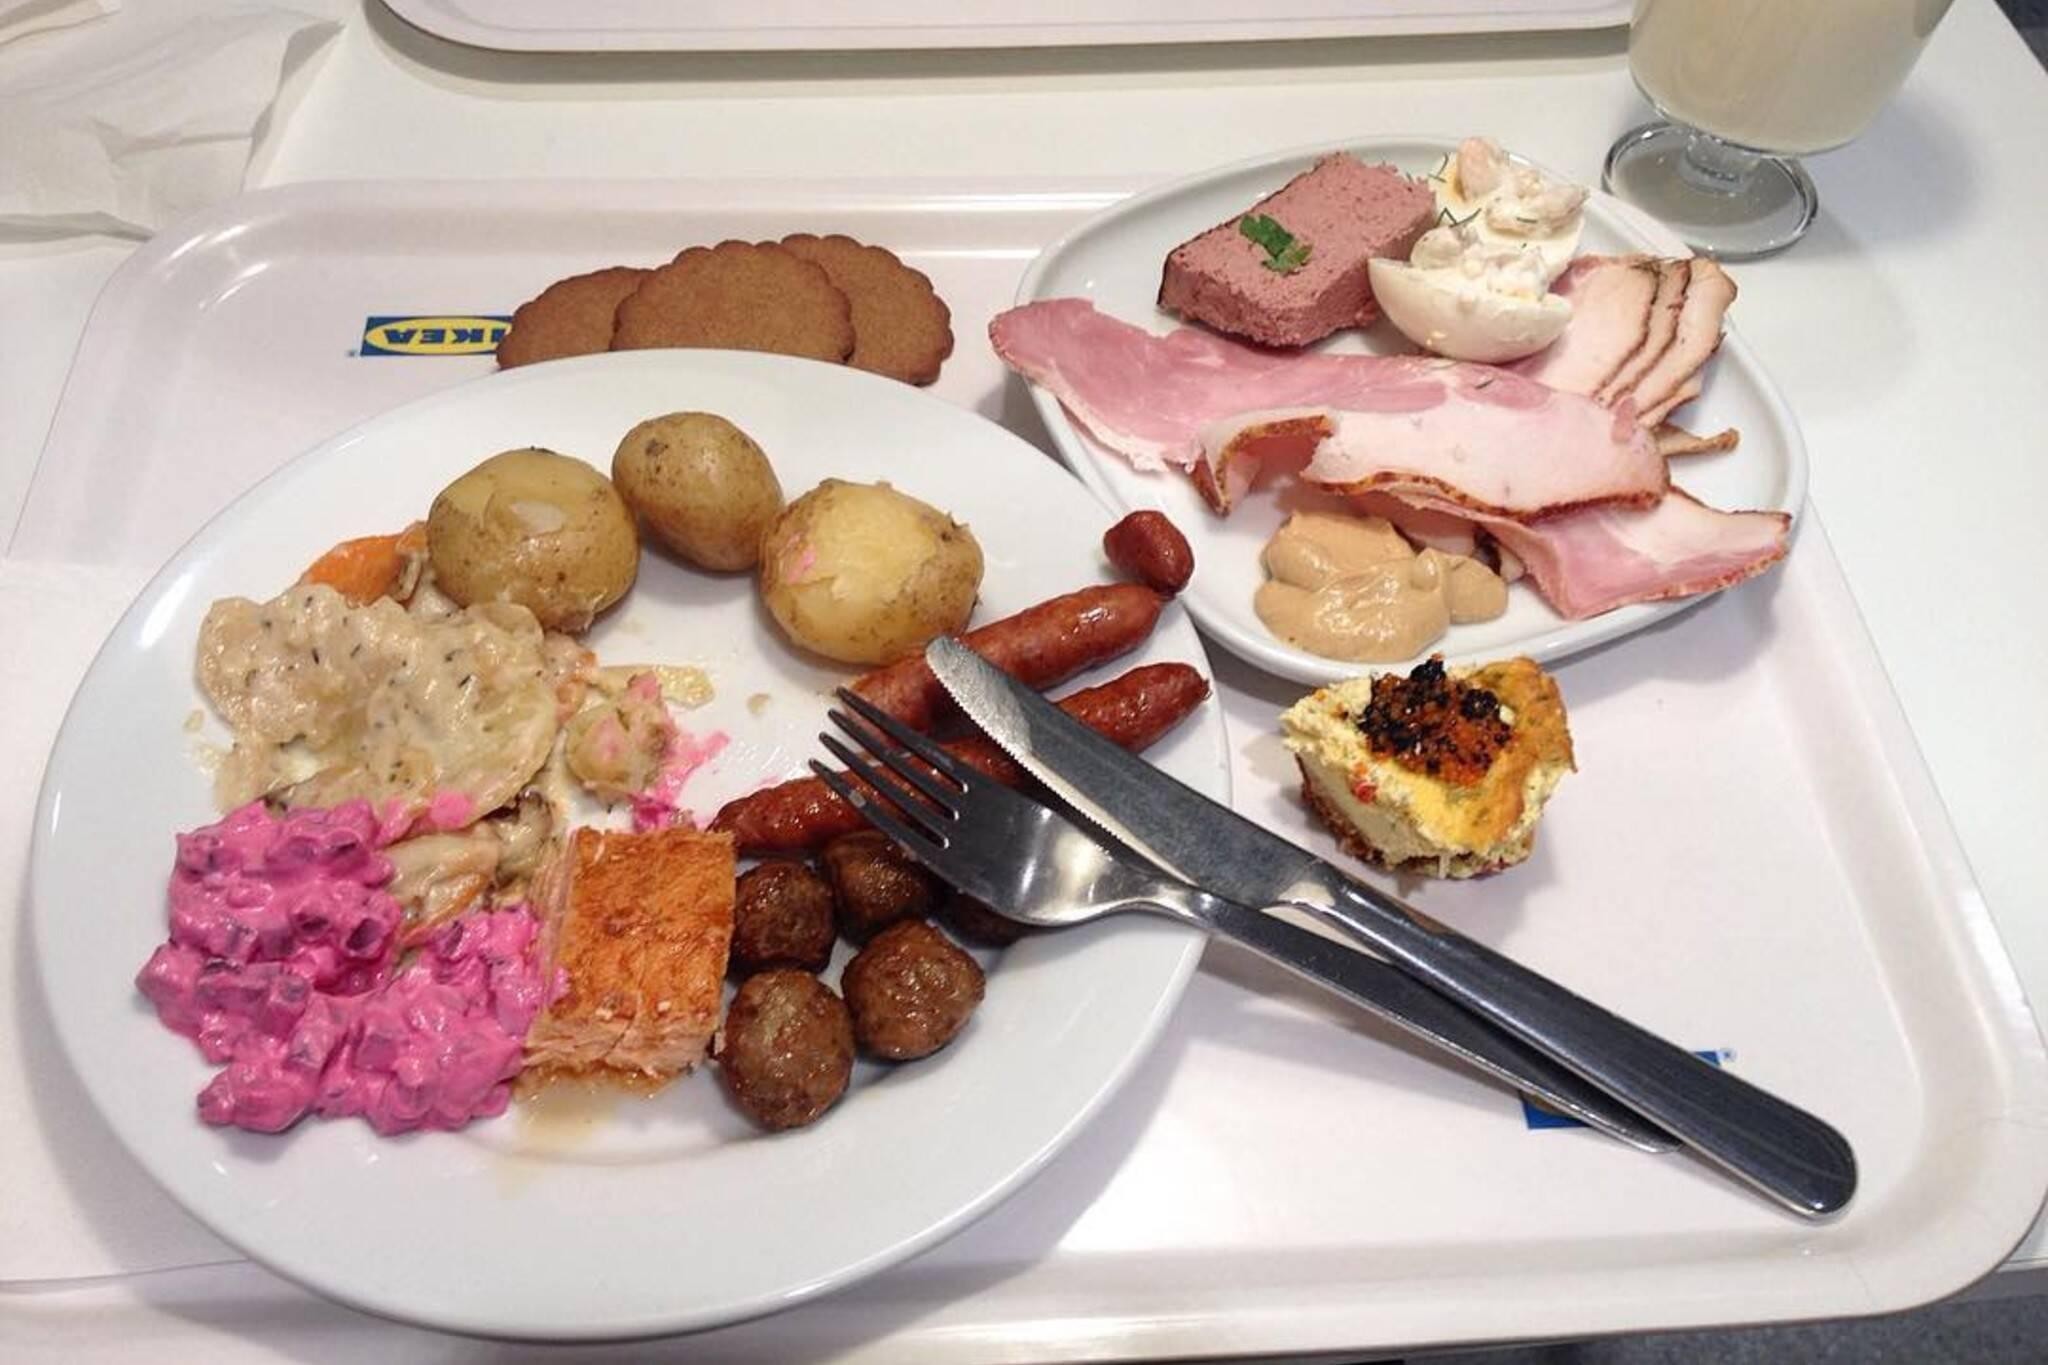 ikea holiday buffet